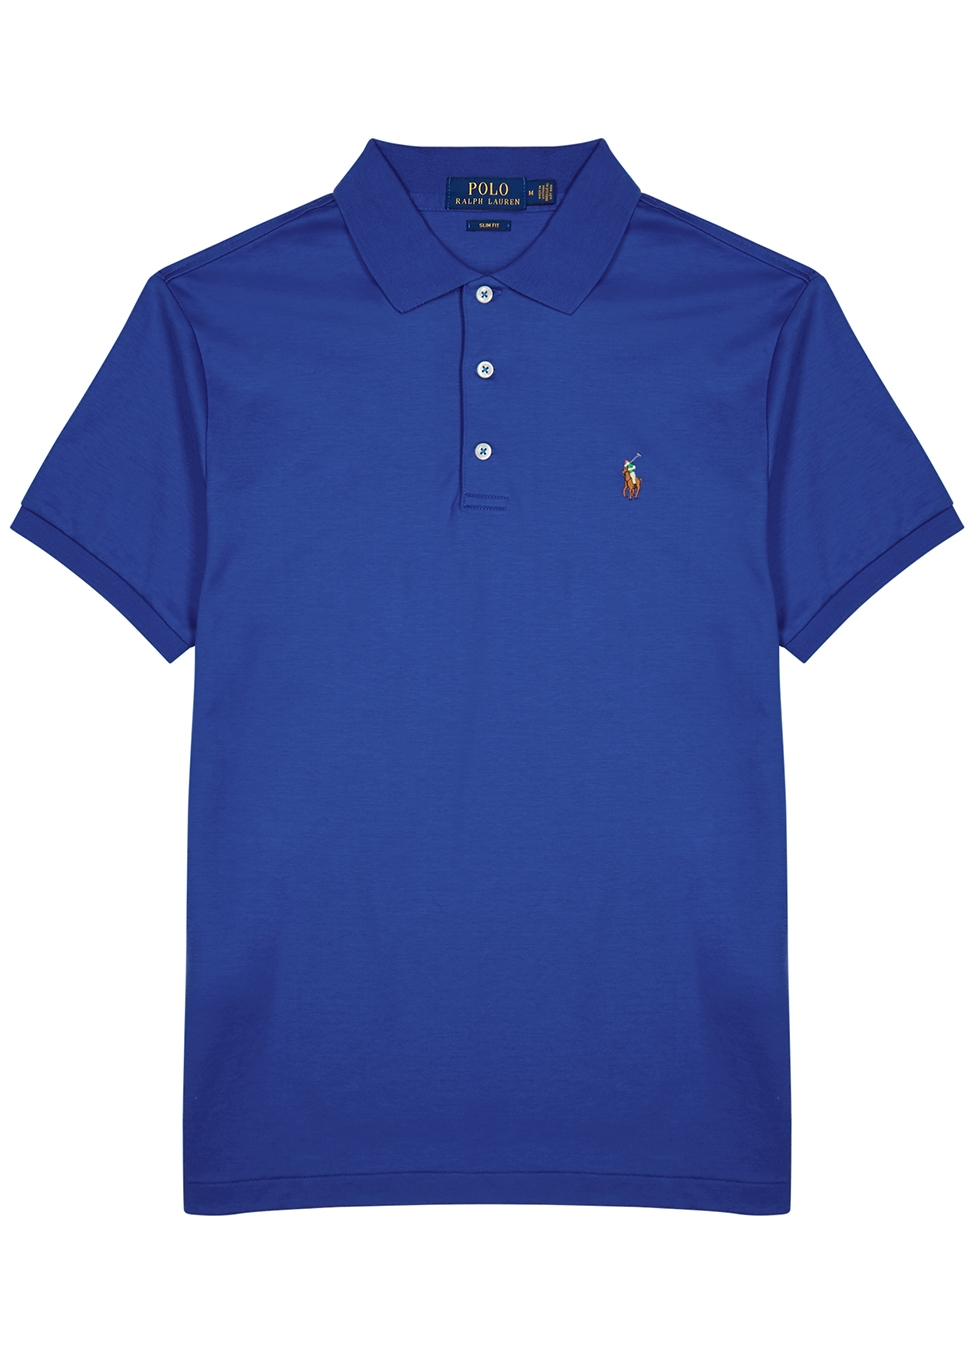 Nichols Lauren ShirtsT Polo Jumpers Harvey Ralph b6yfIYgm7v